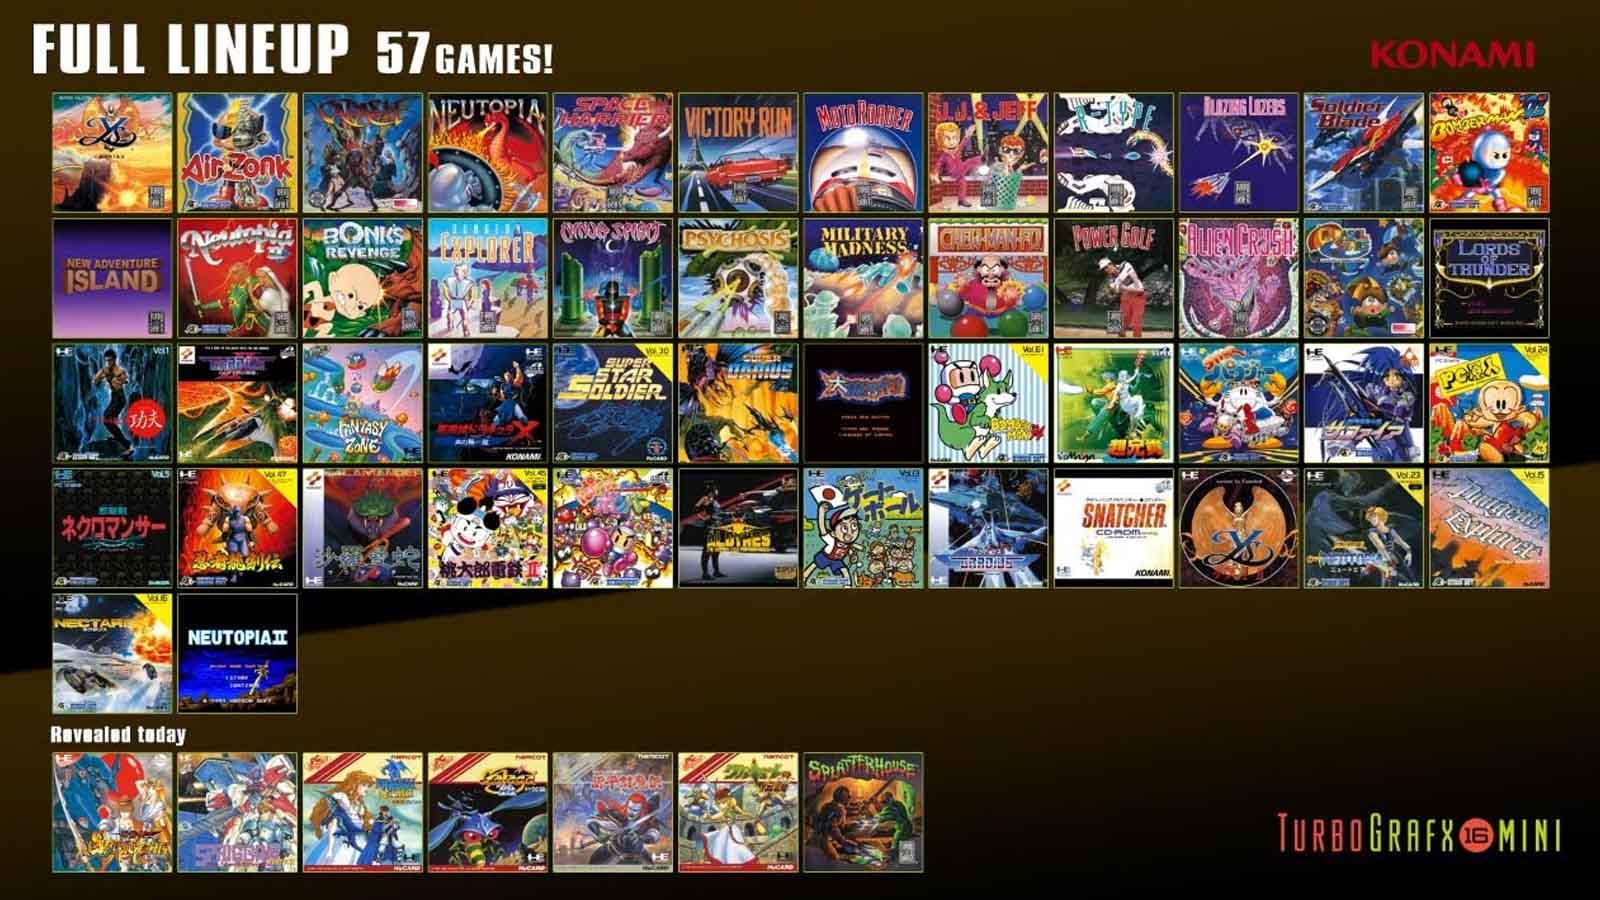 turbografx-16 mini game lineup